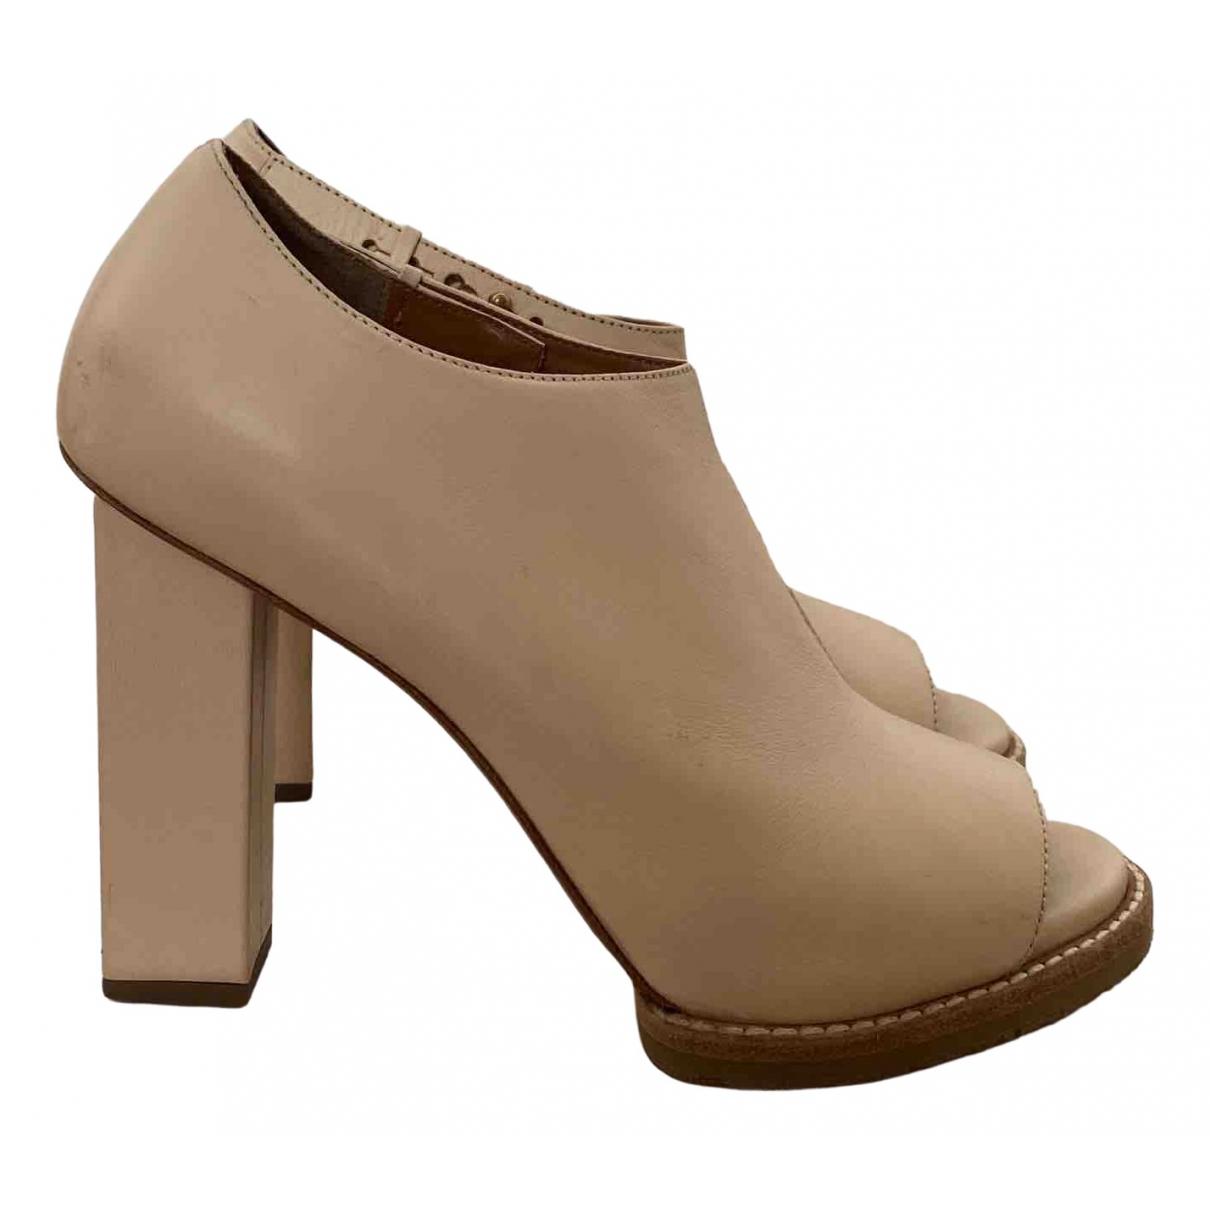 & Stories N Beige Leather Heels for Women 40 EU